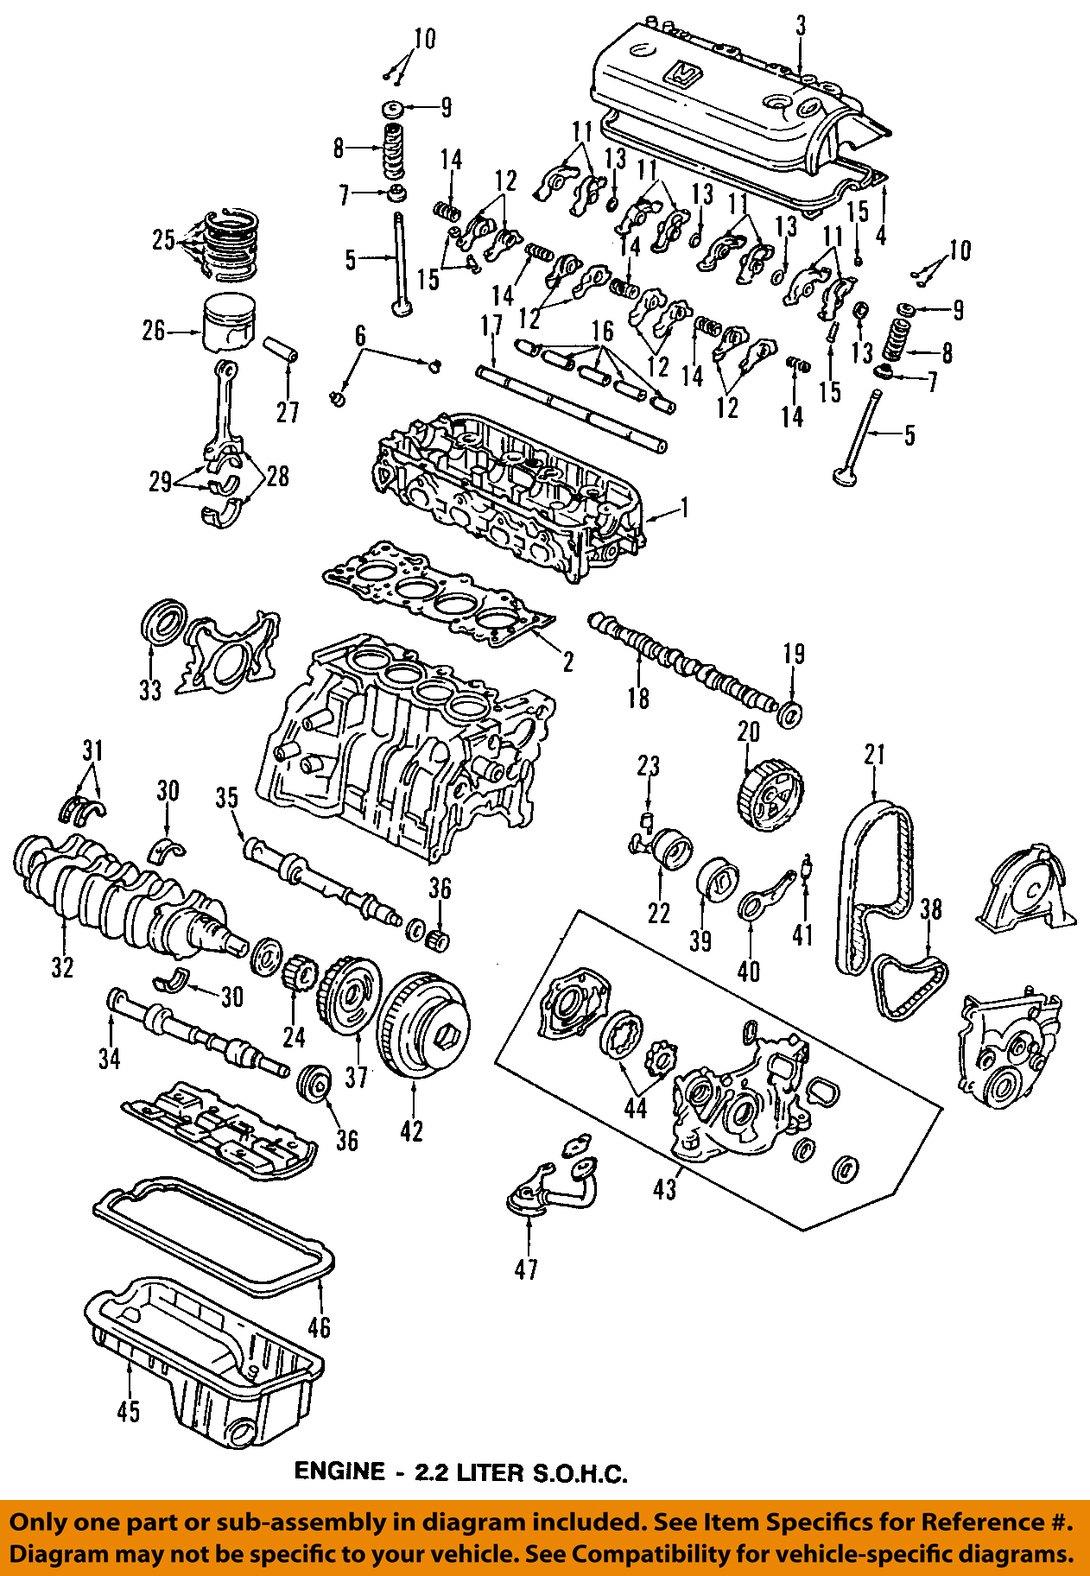 1997 Honda Accord Engine Diagram - Honda Oem Accord Valve Cover Gasket Pt - 1997 Honda Accord Engine Diagram